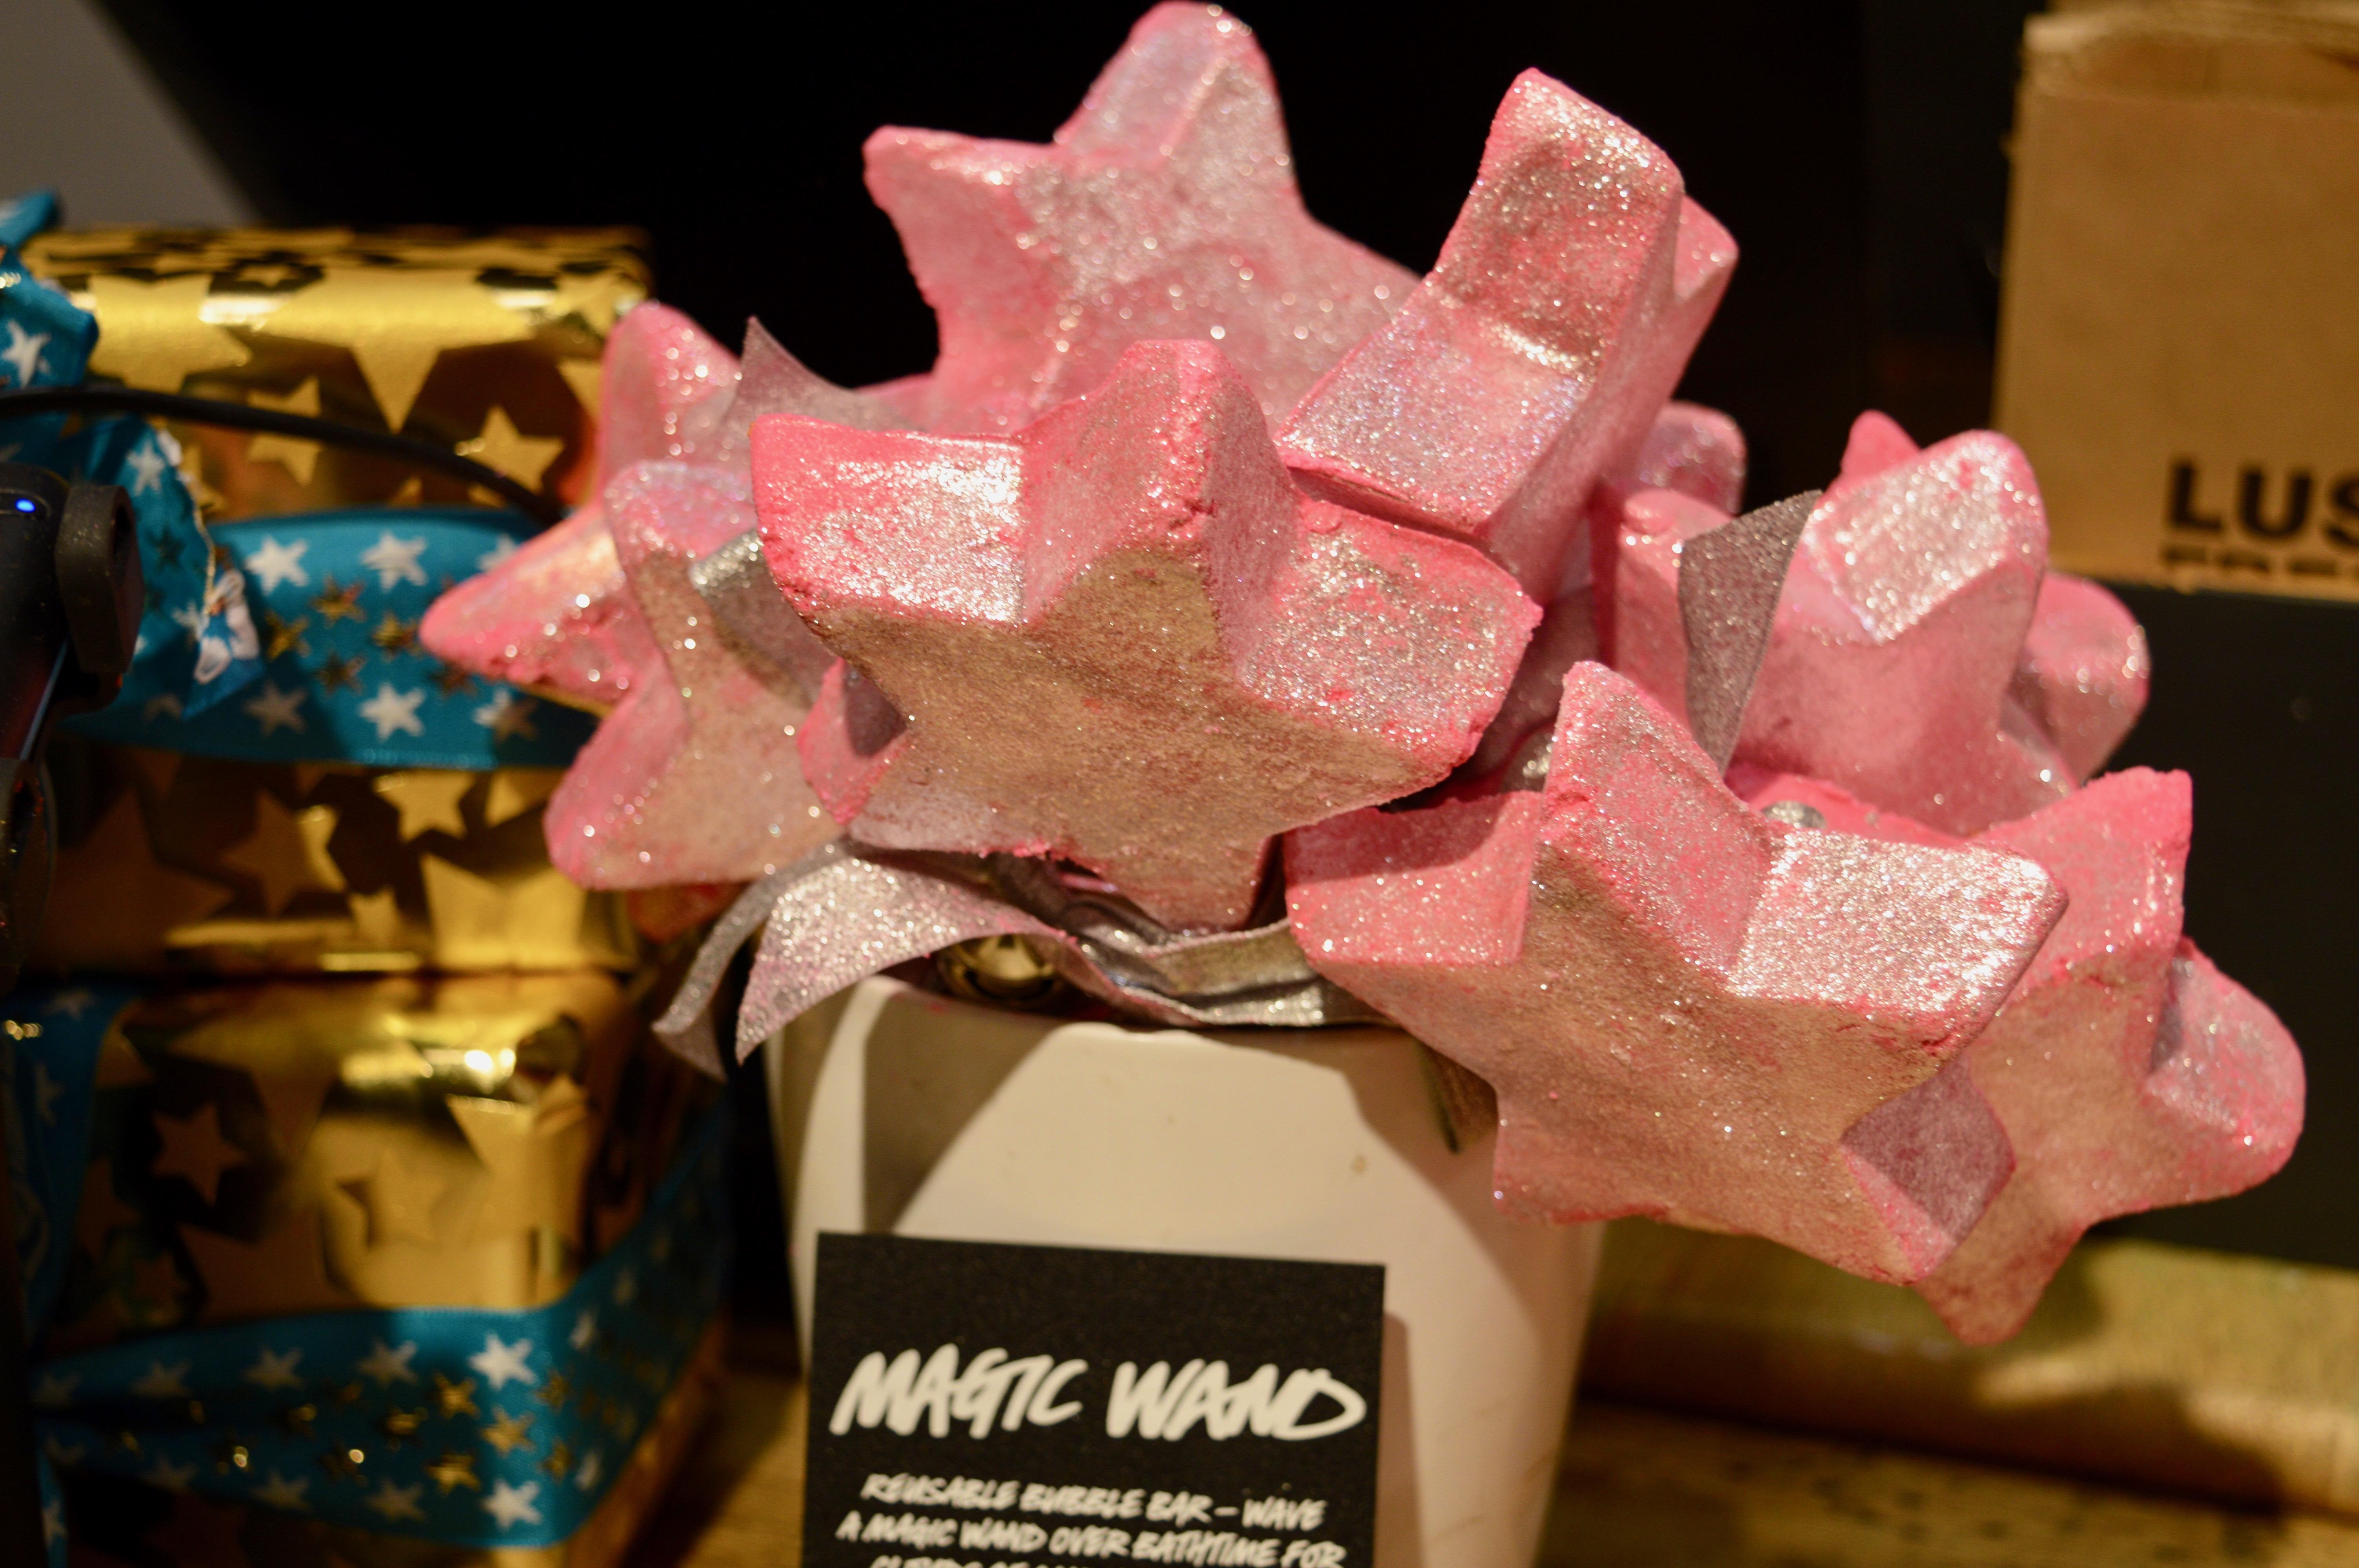 magic-wand-lush-intu-eldon-square-newcastle-bloggers-breakfast-elle-blonde-luxury-lifestyle-destination-blog